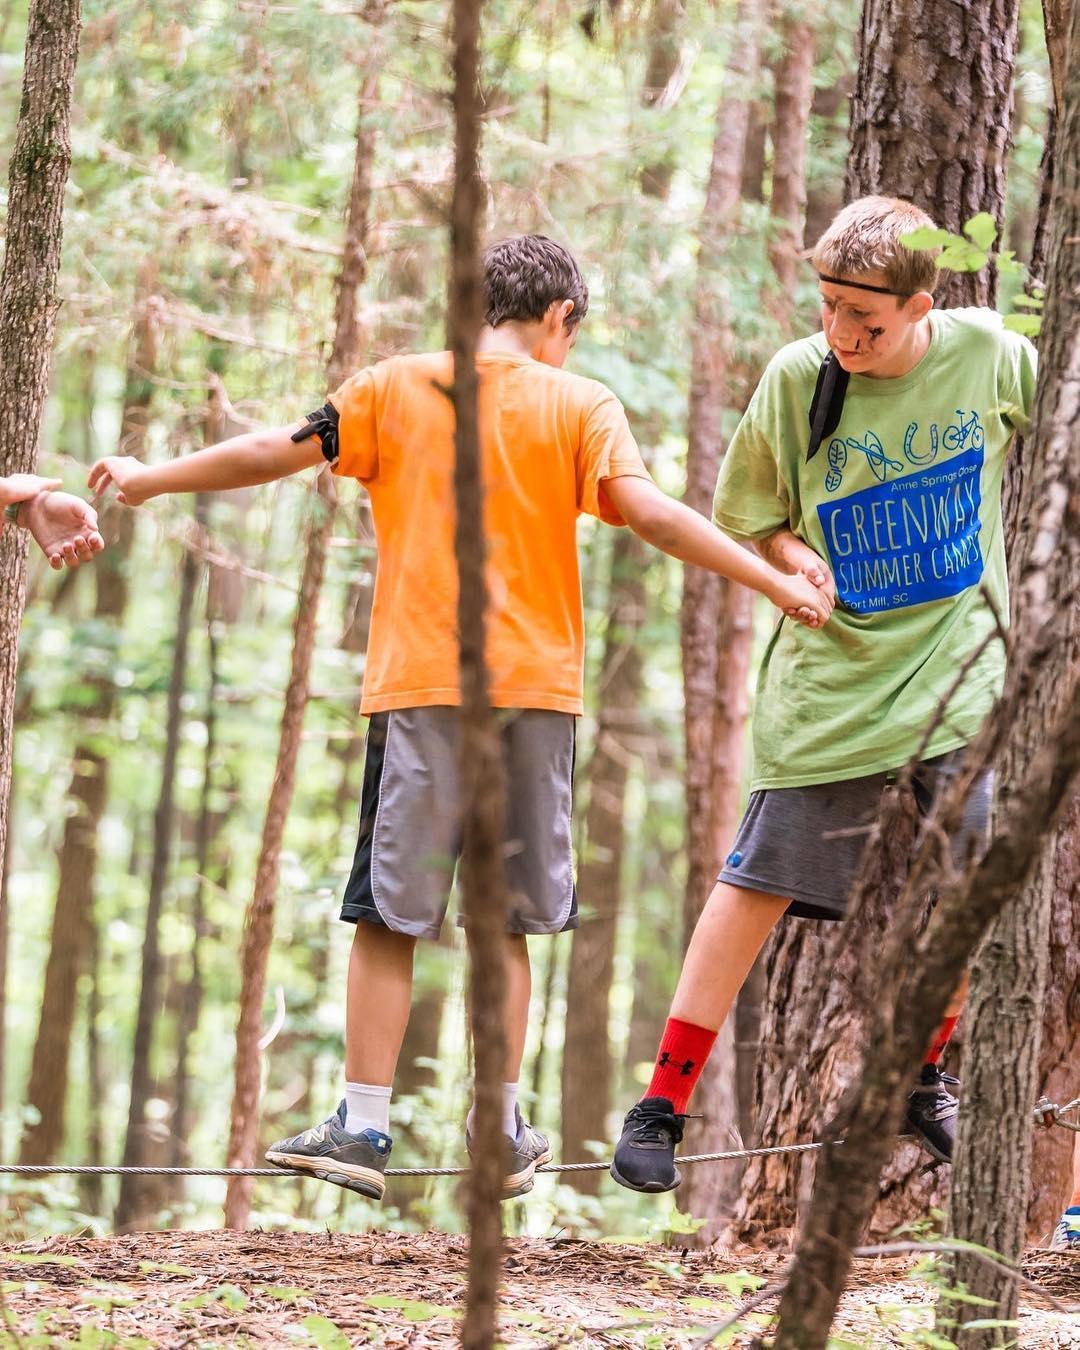 Boys walking slack line at Greenway Summer Camp